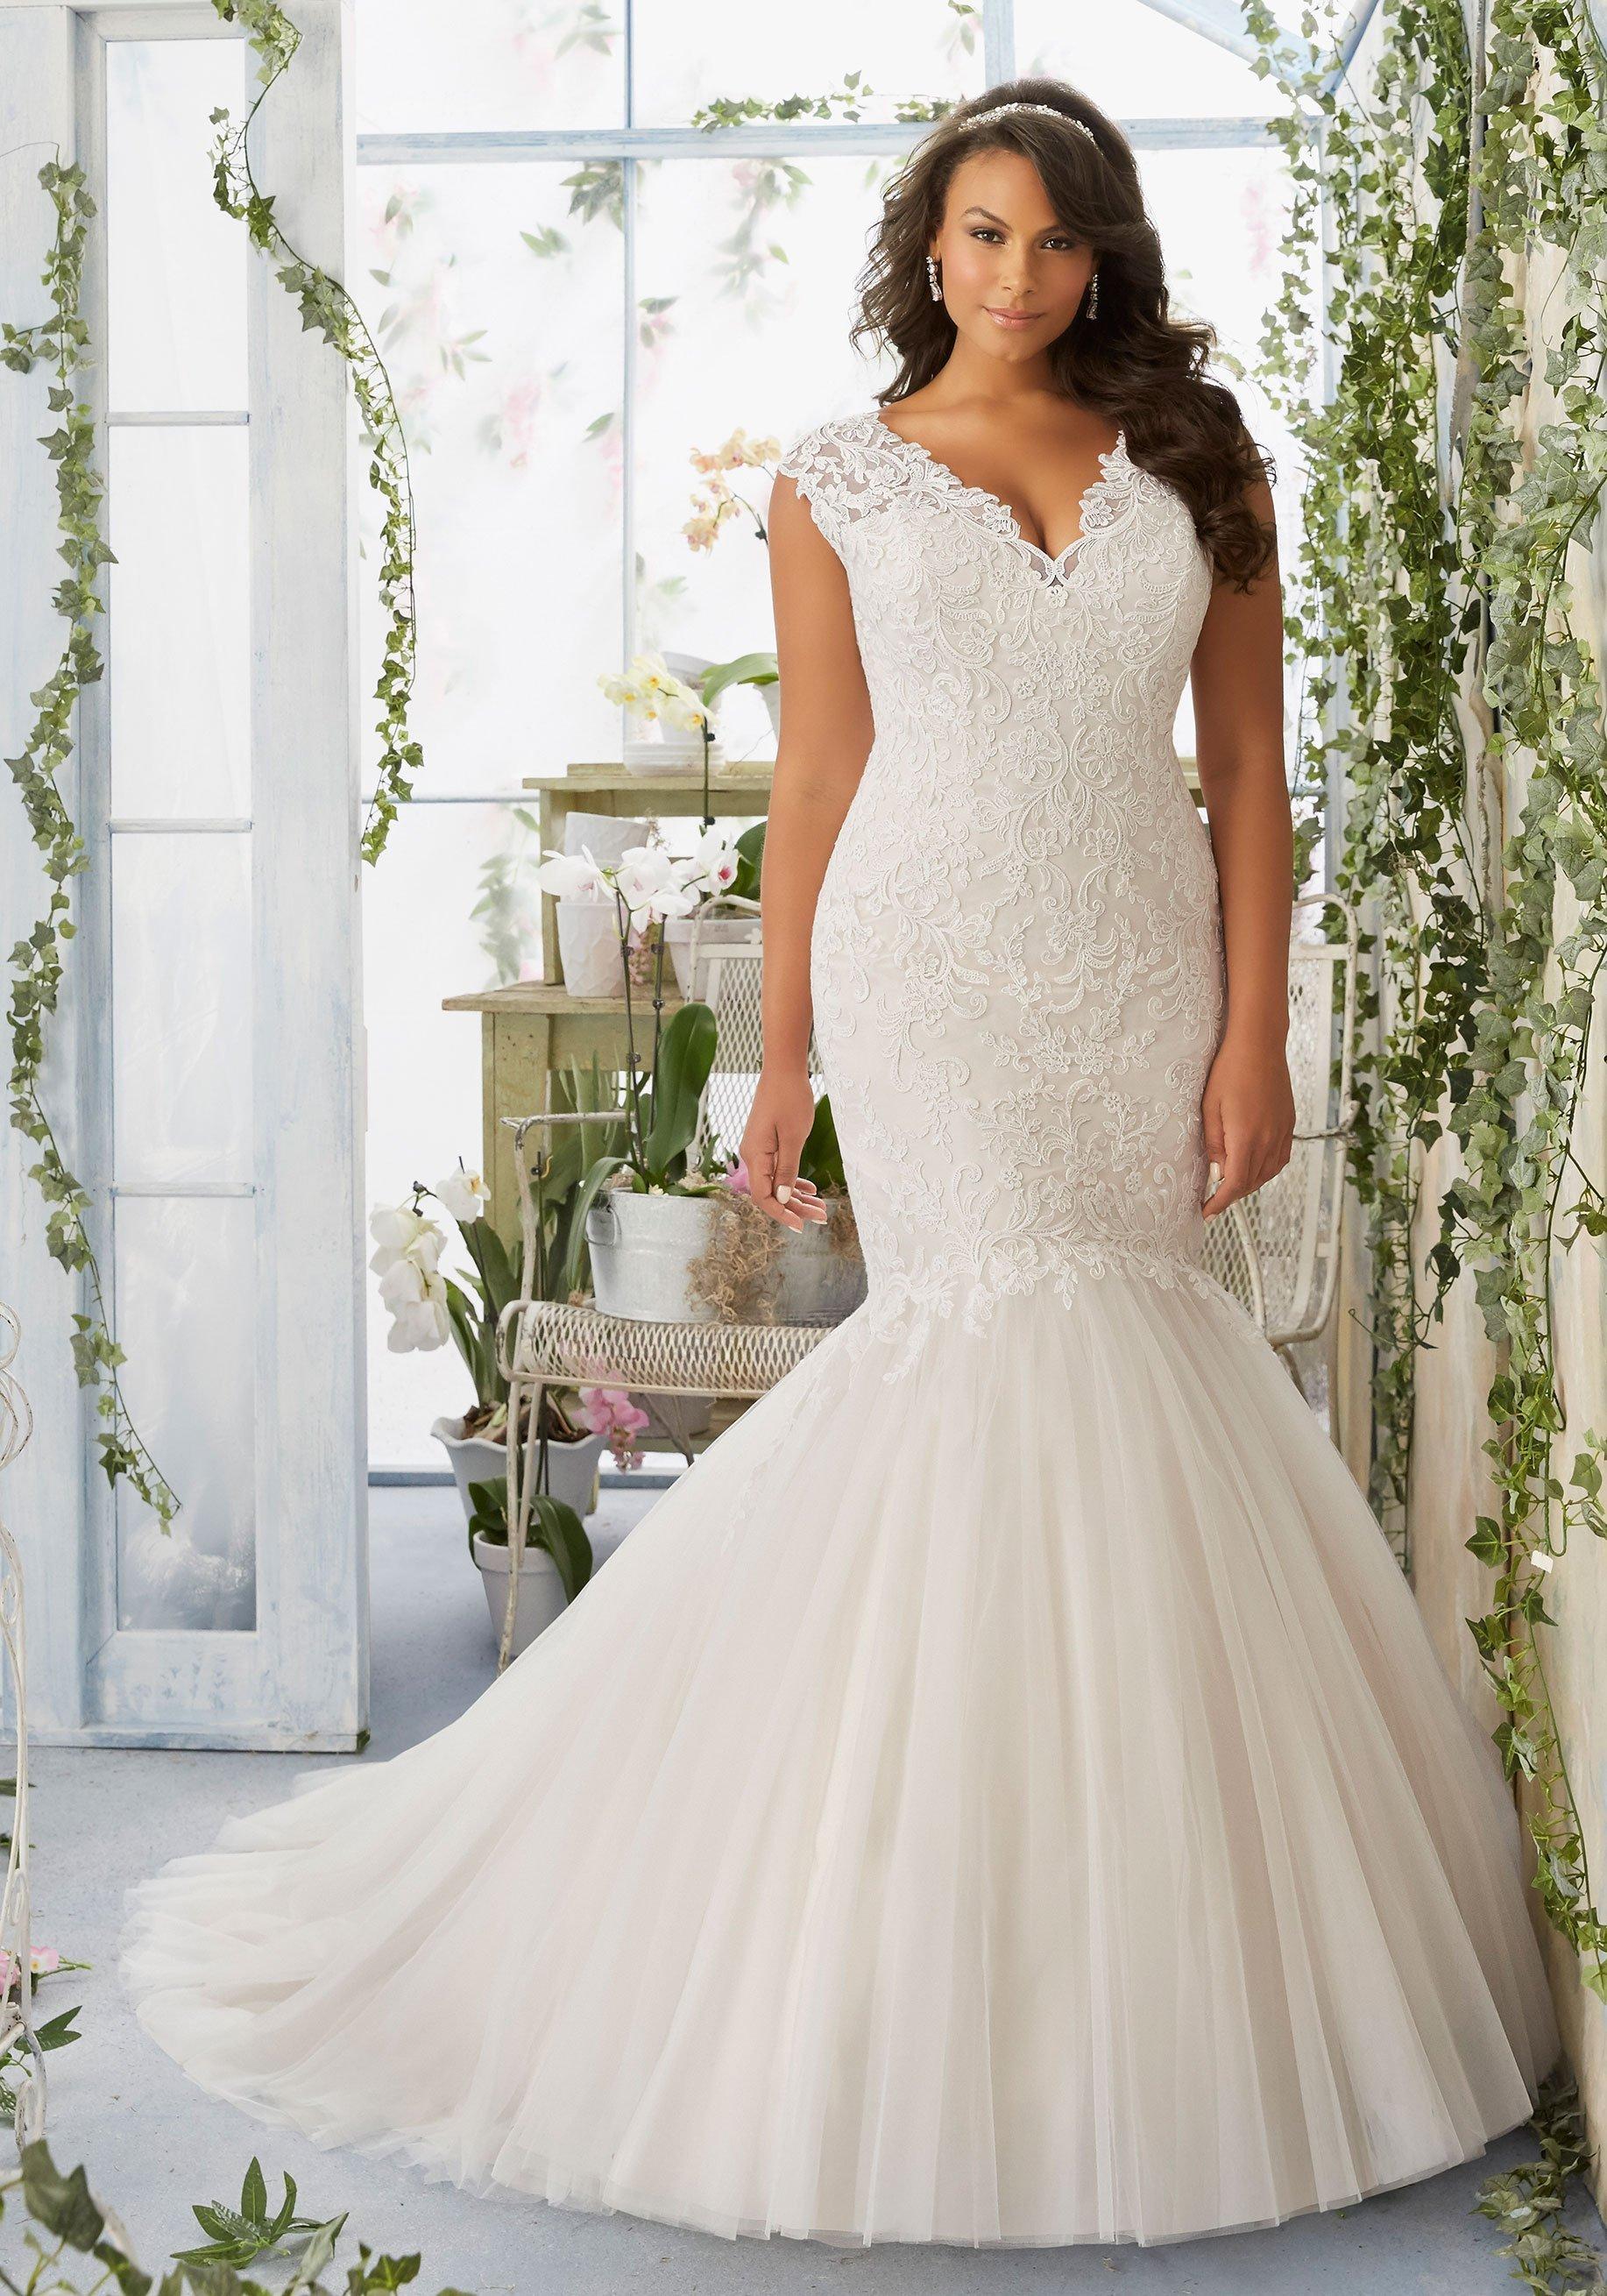 c3e8cc637ab Simple Wedding Dresses Online Uk